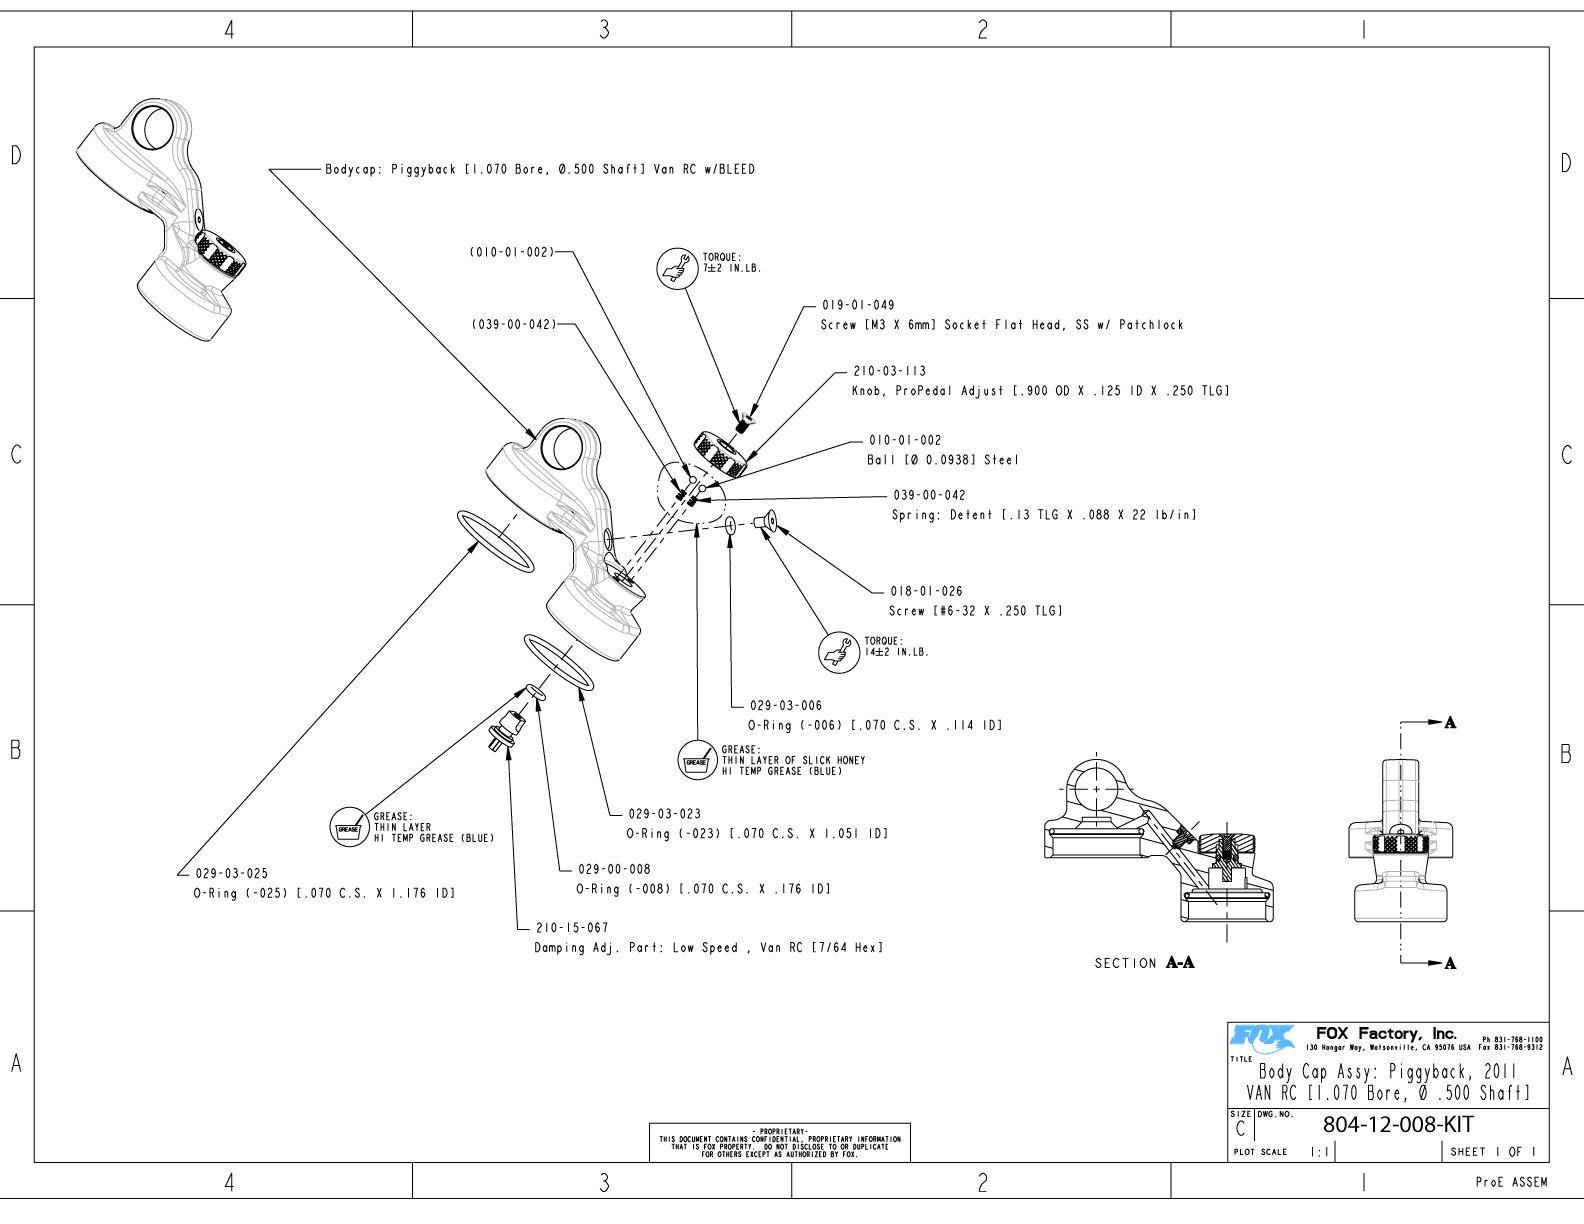 van rc part information bike help center fox SAE O-Ring Size Chart 804 12 008 kit body cap assy piggyback 2011 van rc 1 070 bore 500 shaft